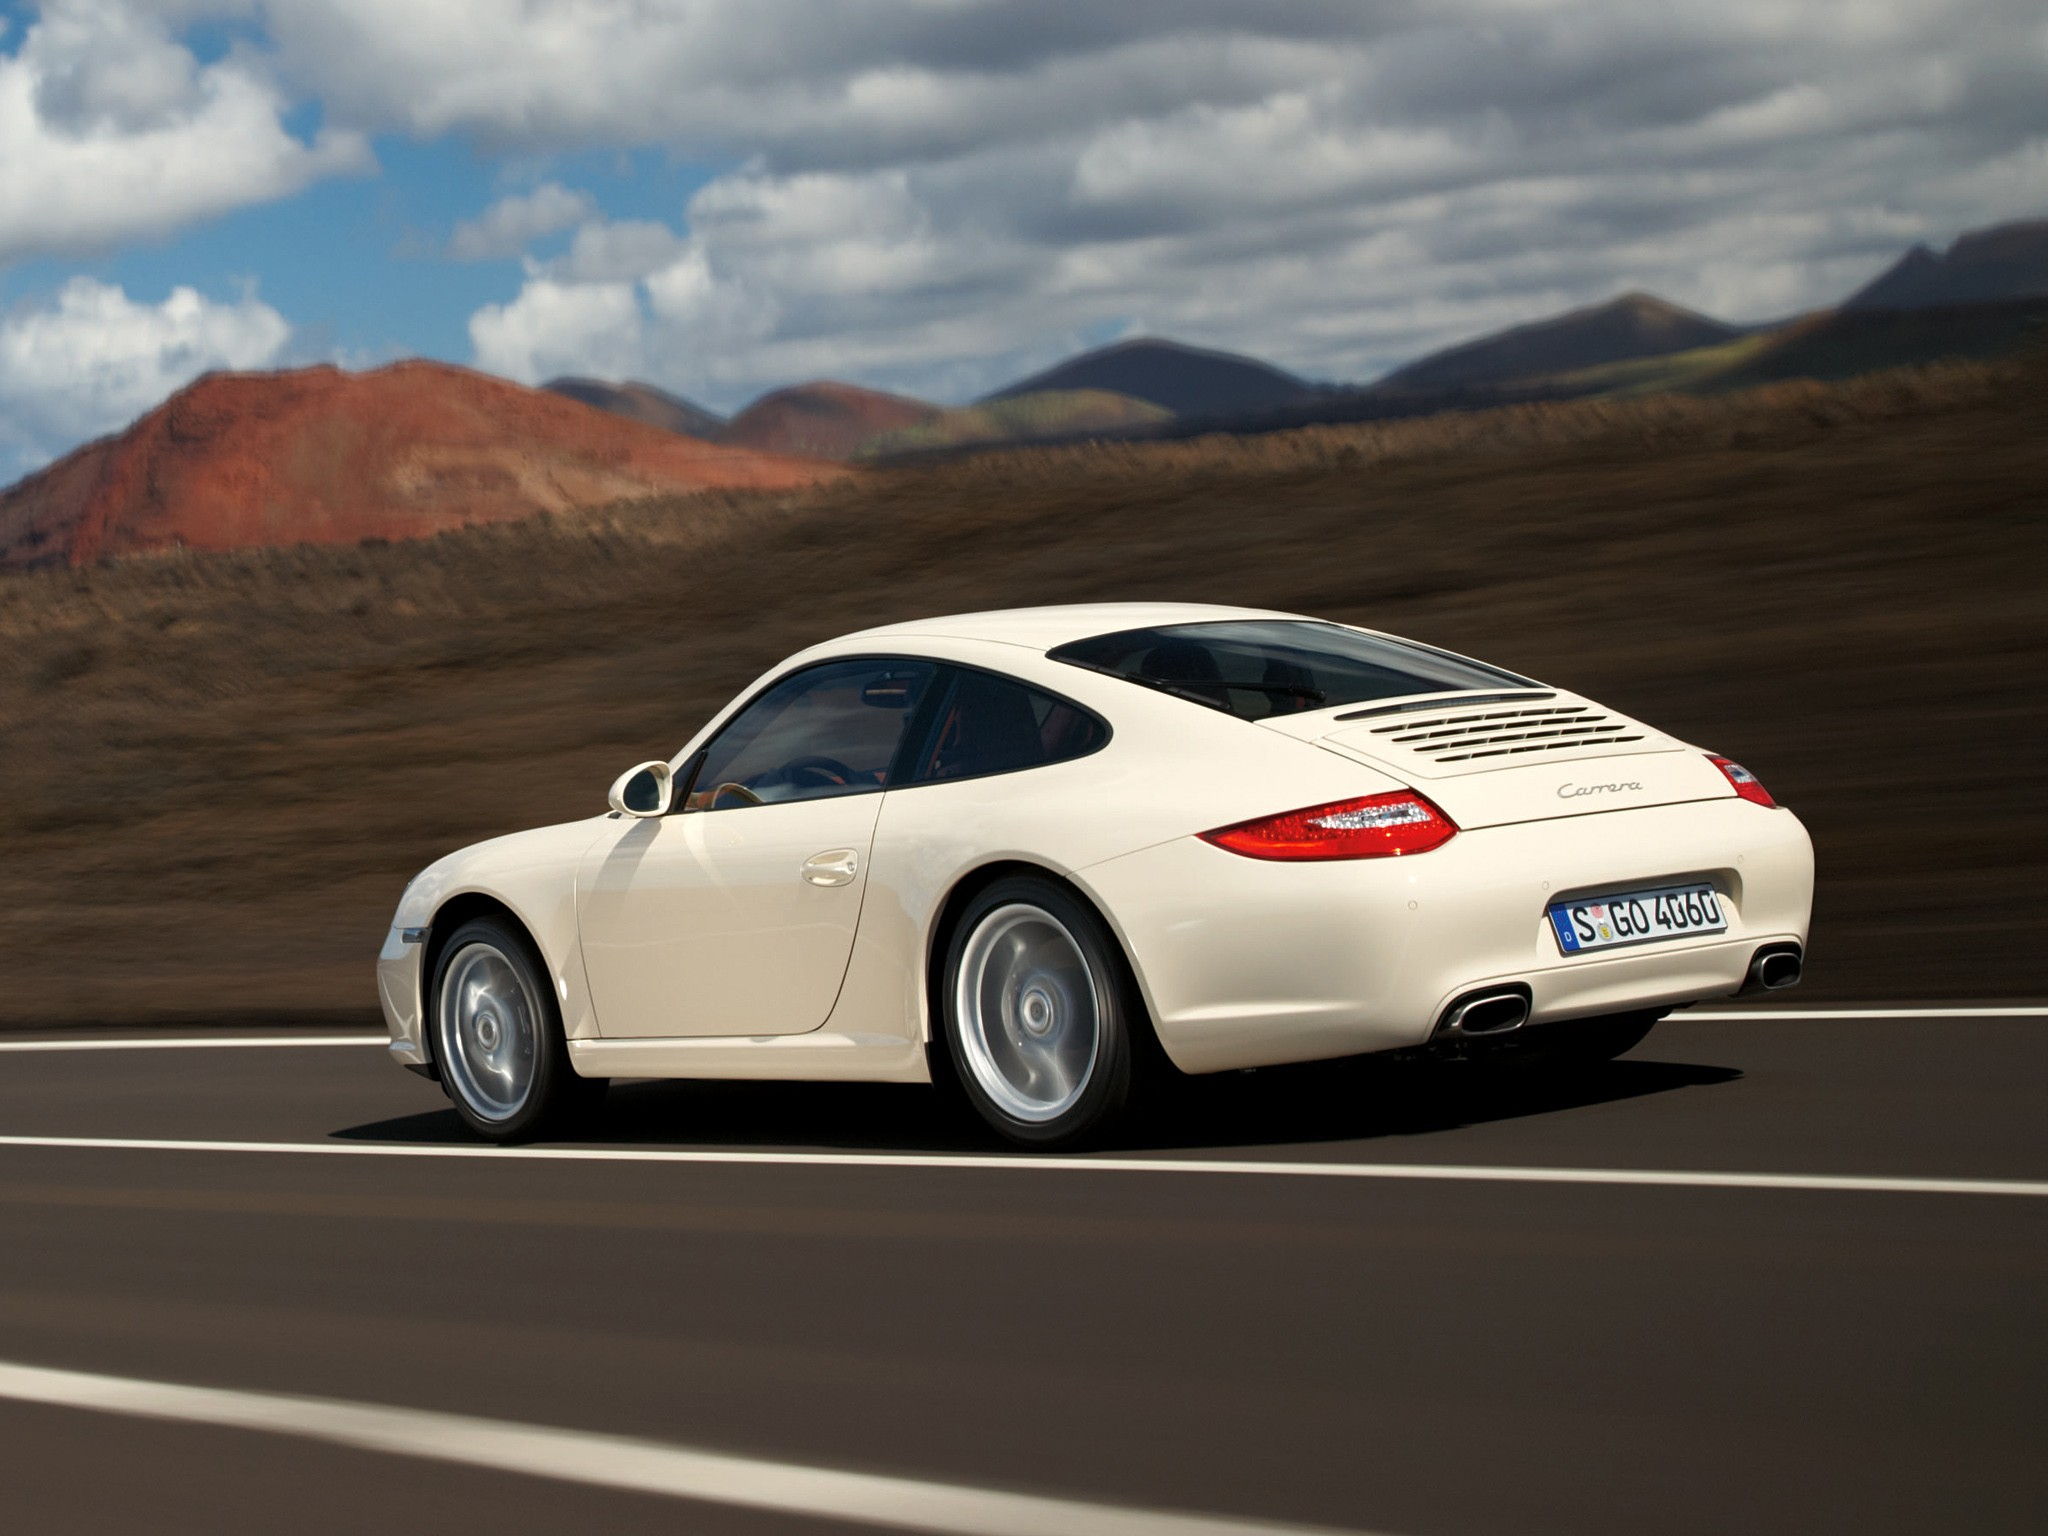 PORSCHE 911 Carrera (997) - 2008, 2009, 2010, 2011, 2012 ...